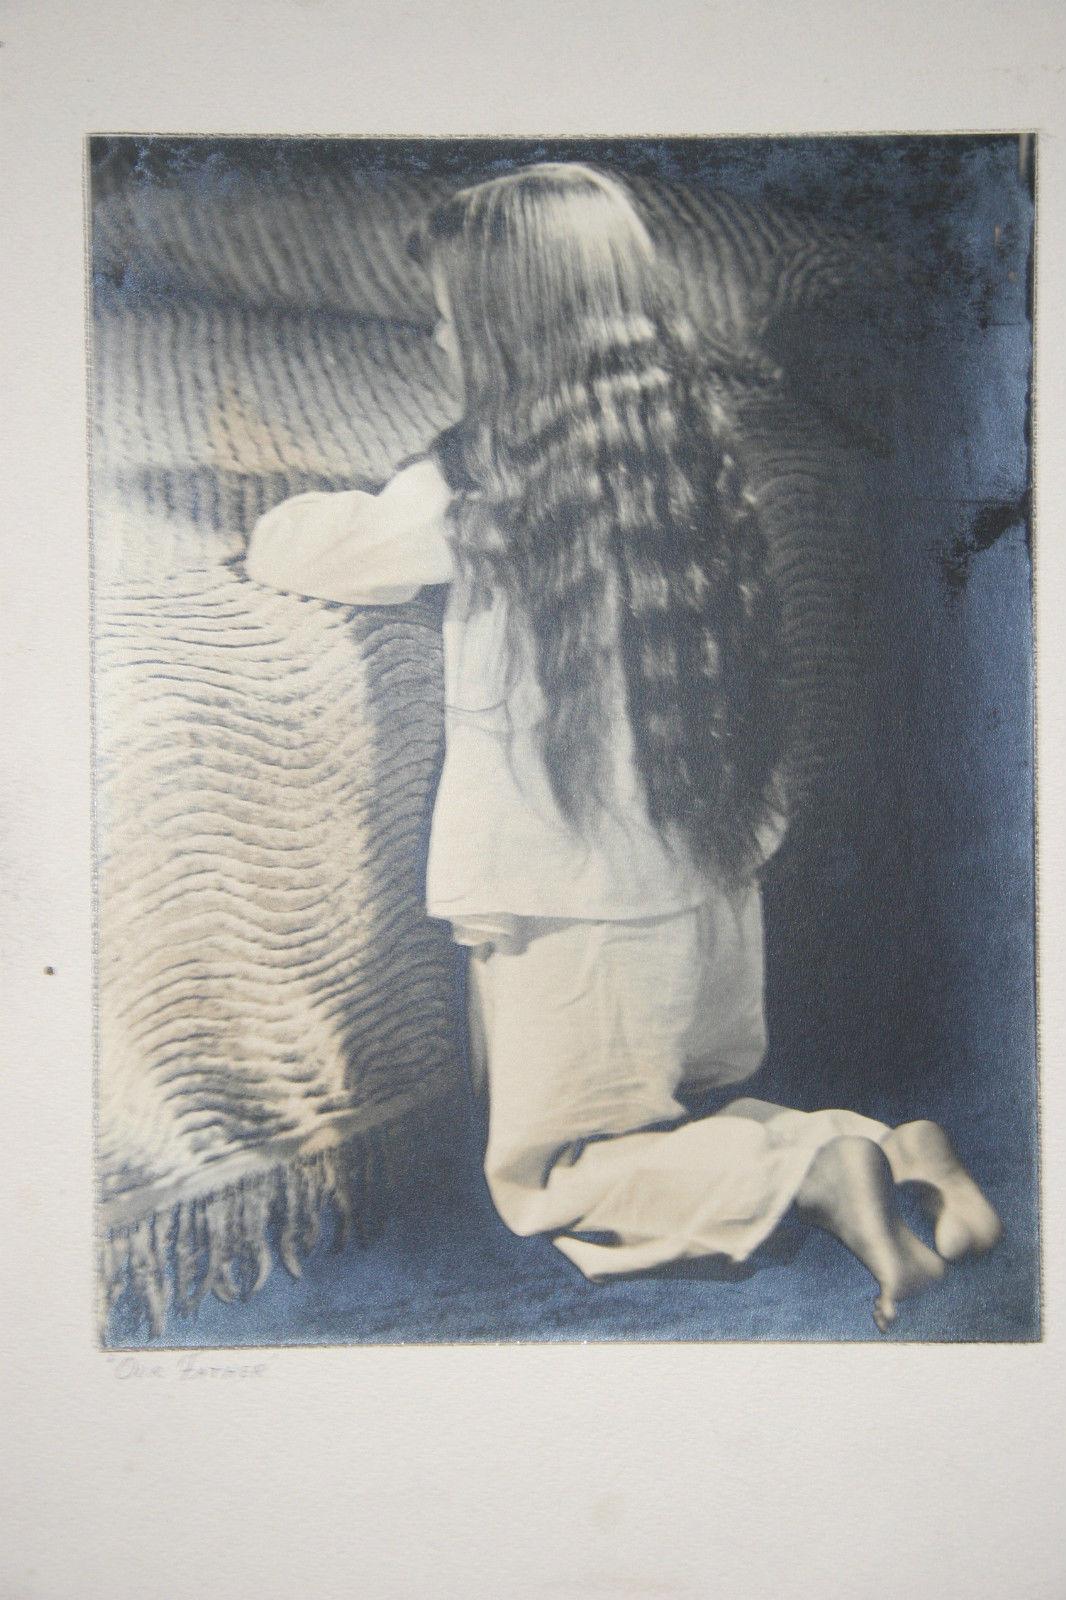 SILVER GELATIN PHOTOGRAPH A LITTLE GIRL PRAYING PHOTO